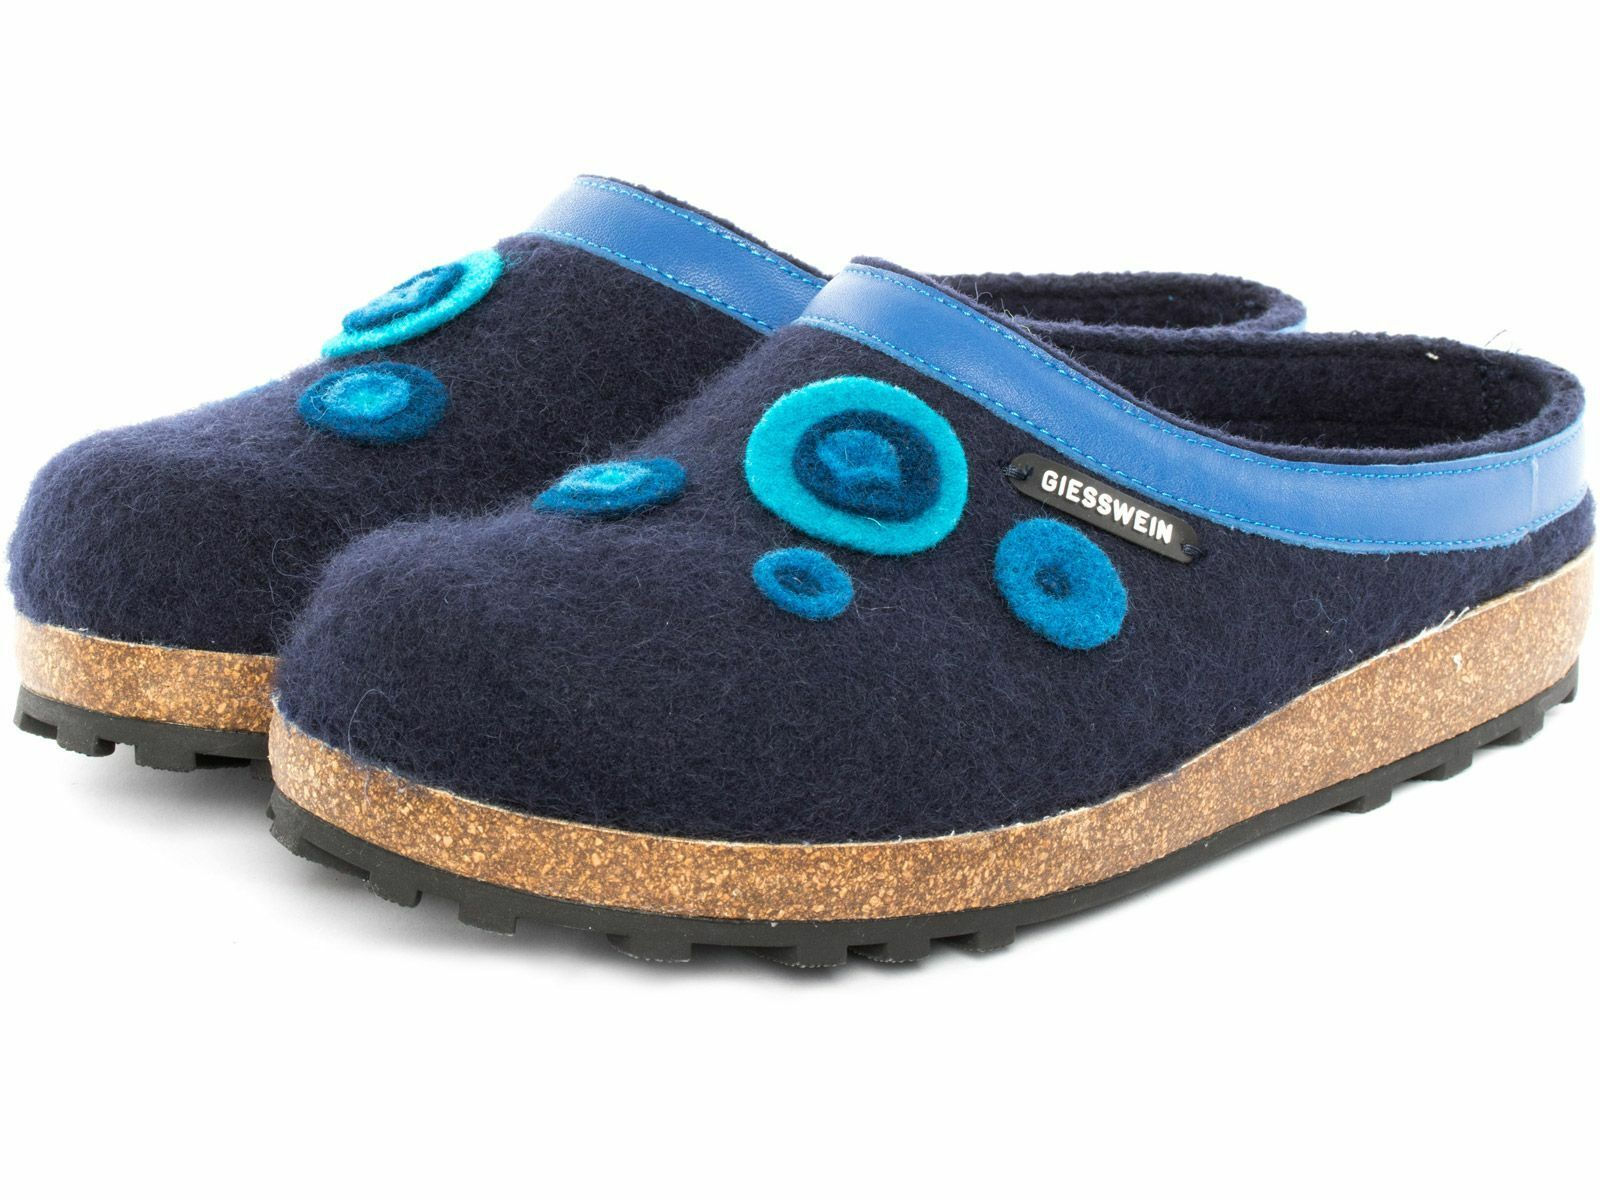 Giesswein Calau Blu Ciabatte Slipper Pantofole 36 - 42 Slipper Ciabatte PER INTERNO + ESTERNO 3e35b9